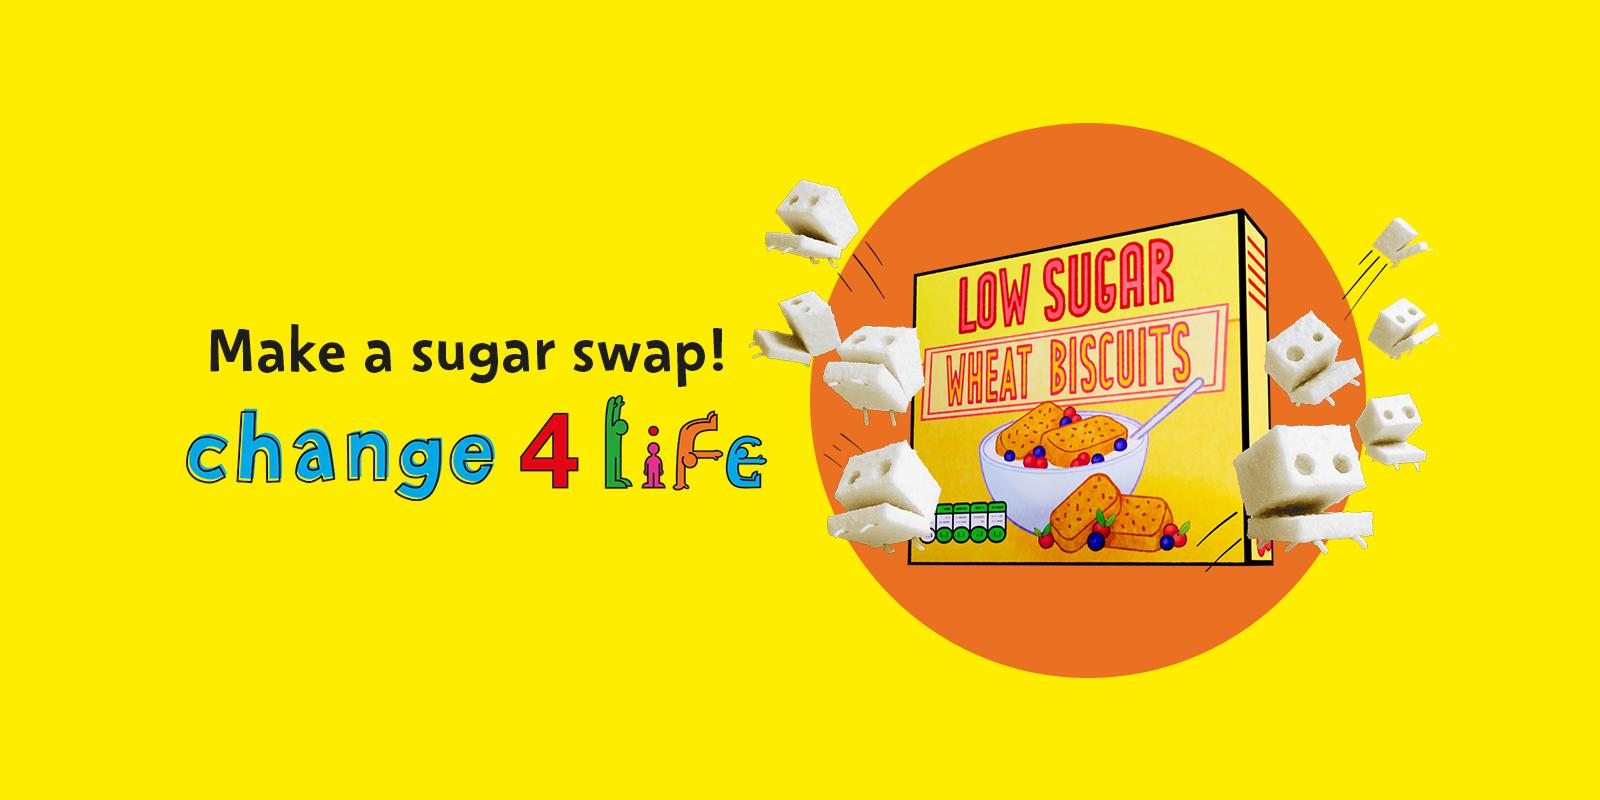 Change4Life sugar swaps helps families cut sugar intake